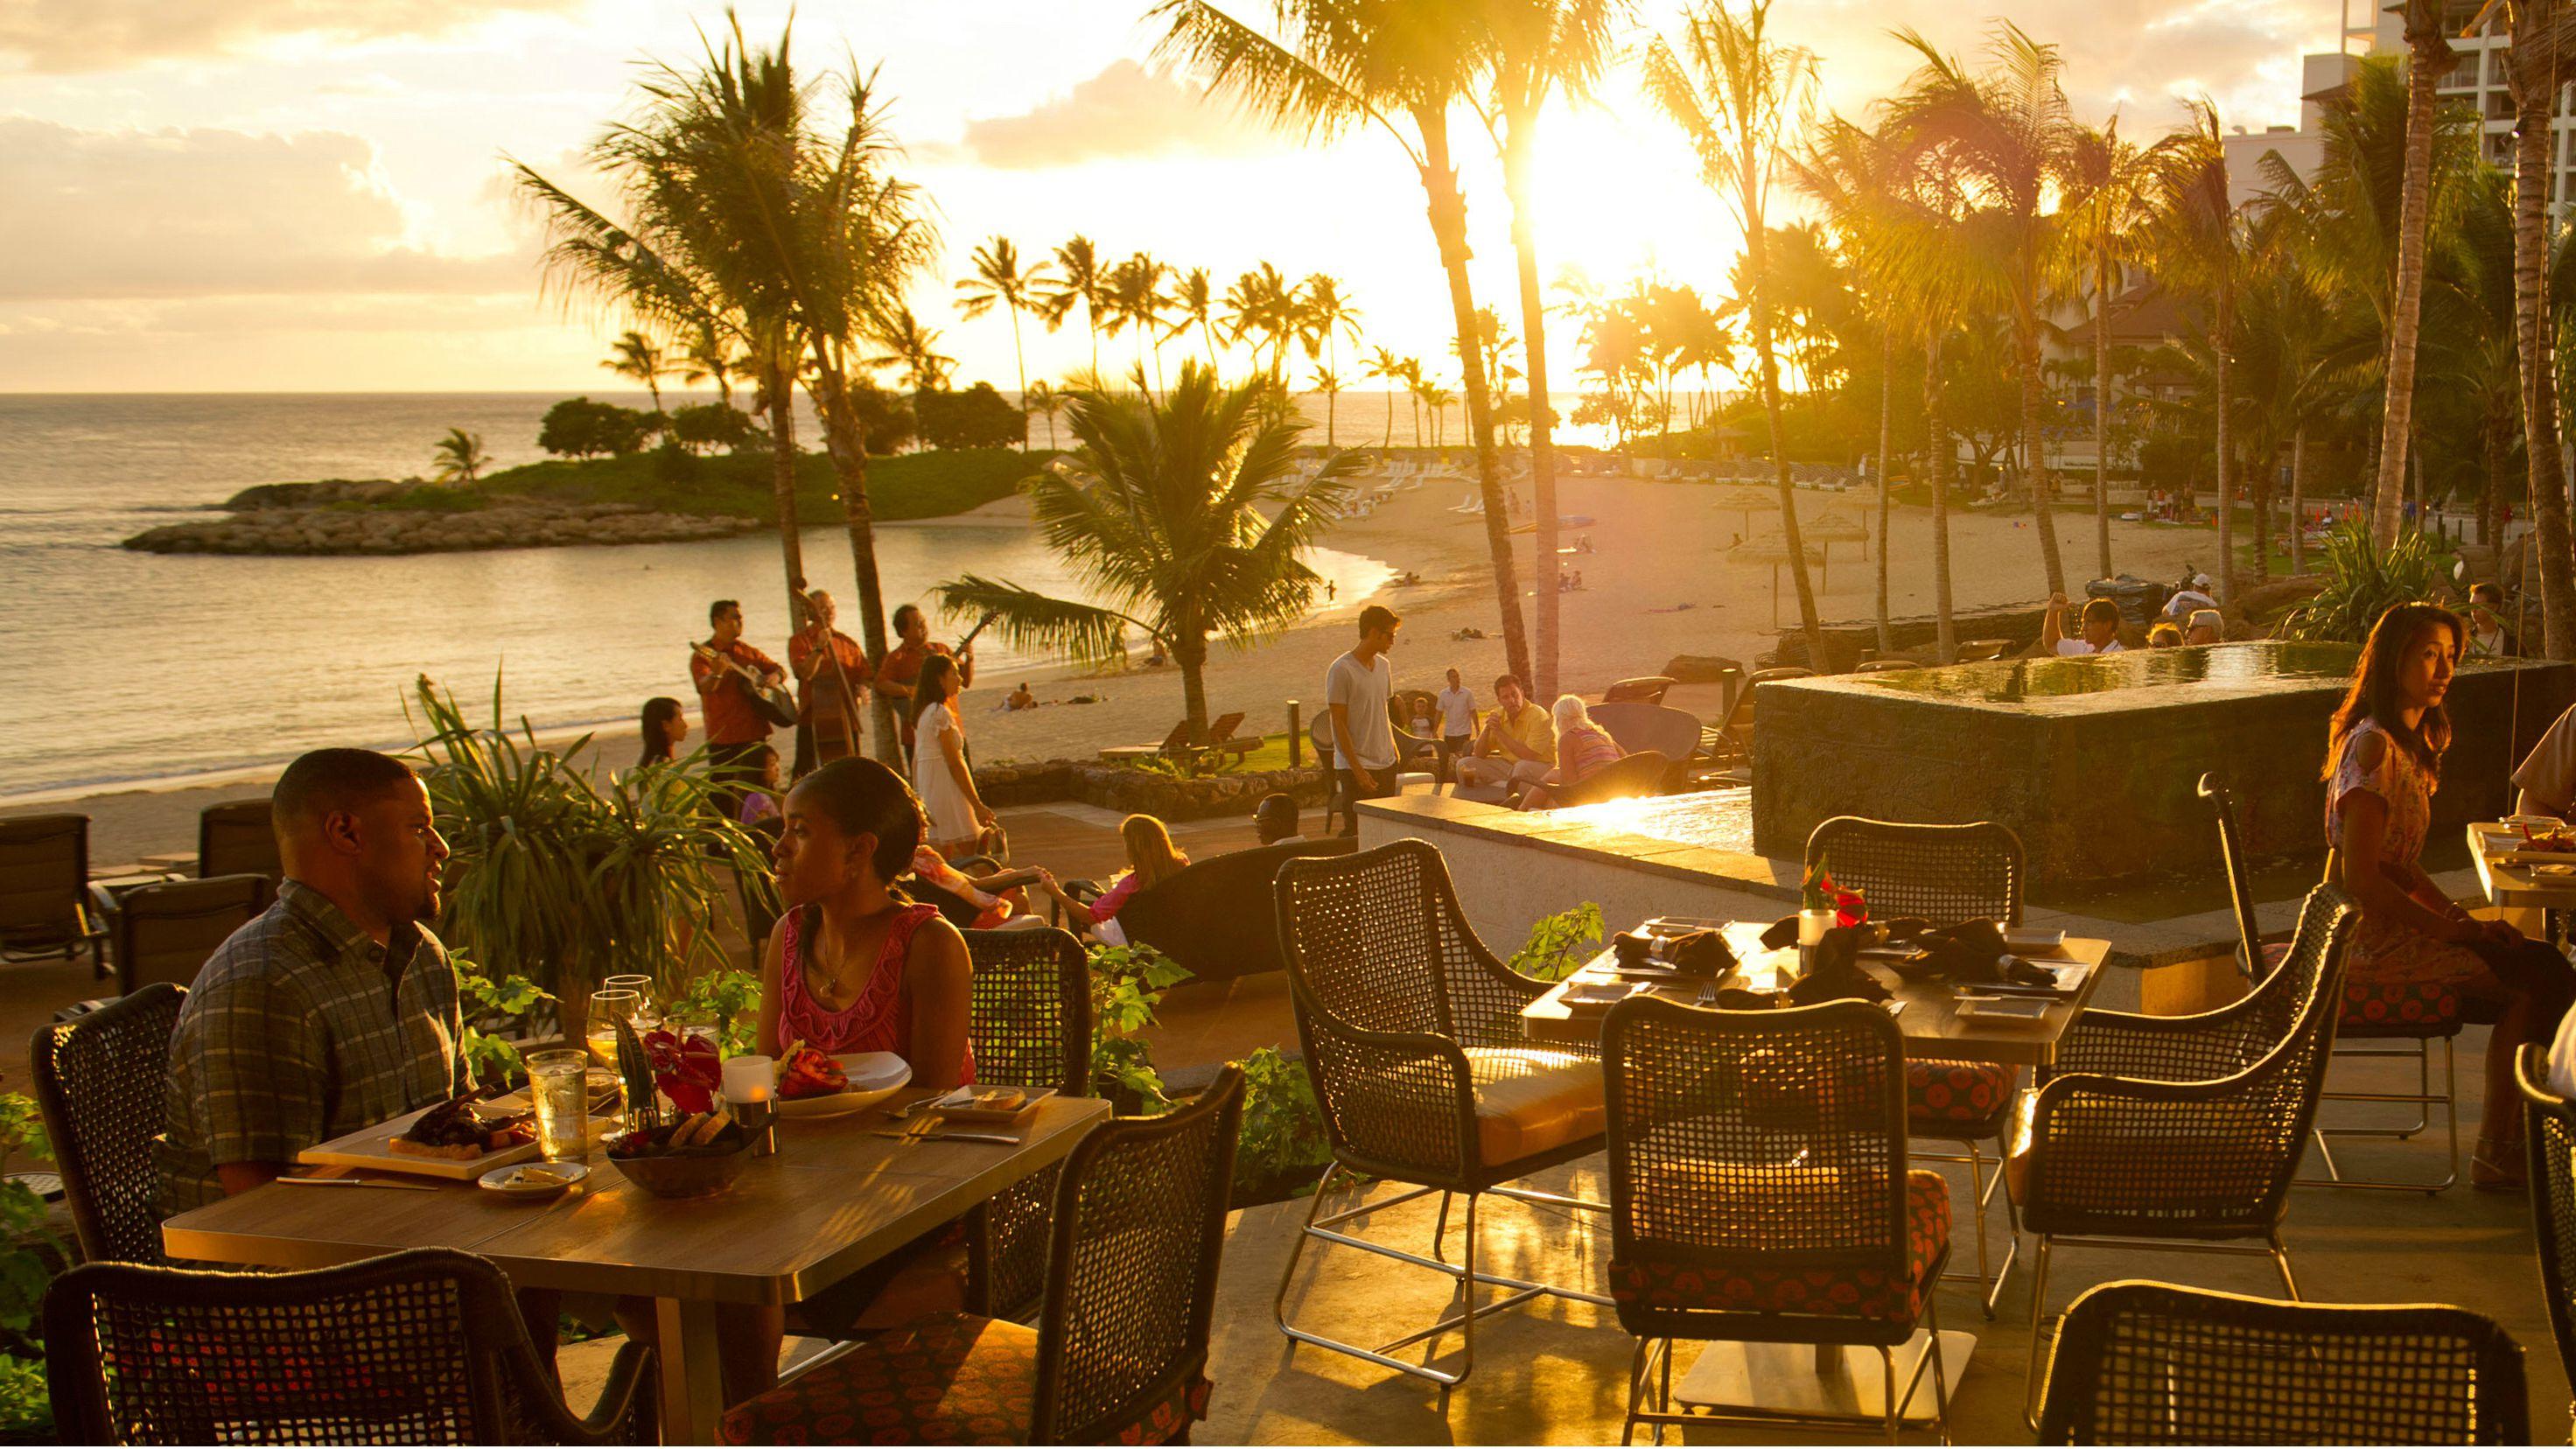 AMA'AMA restaurant at sunset overlooking the beach